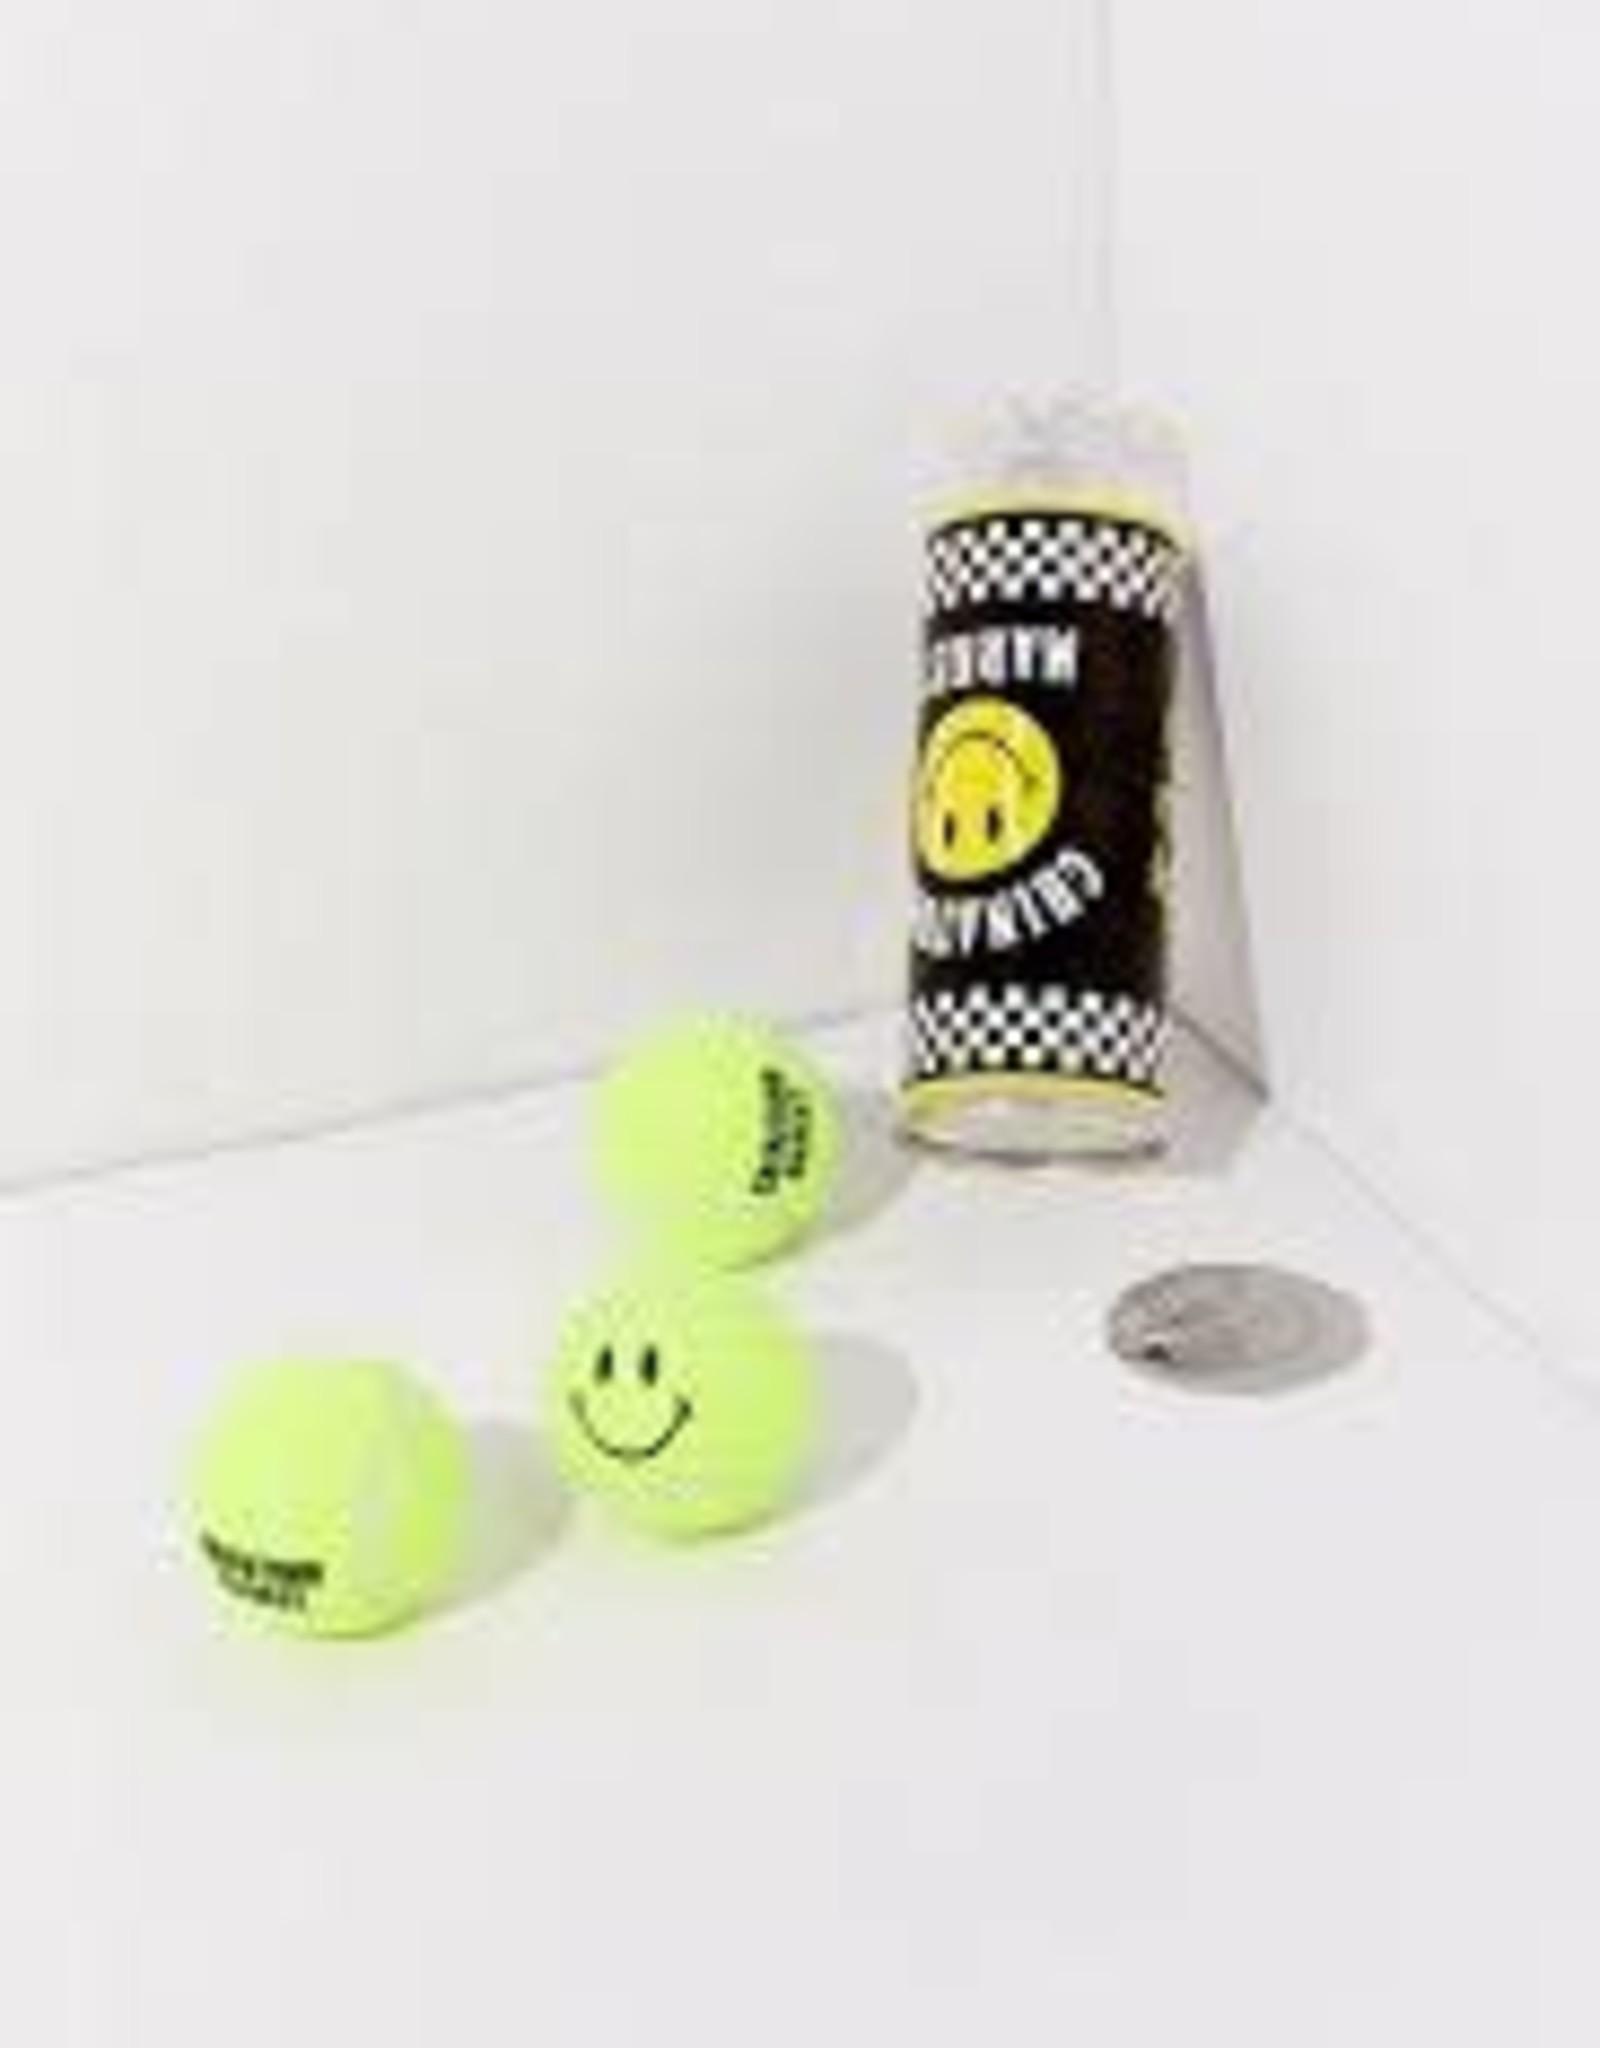 CHINATOWN SMILEY TENNIS BALL TUBE